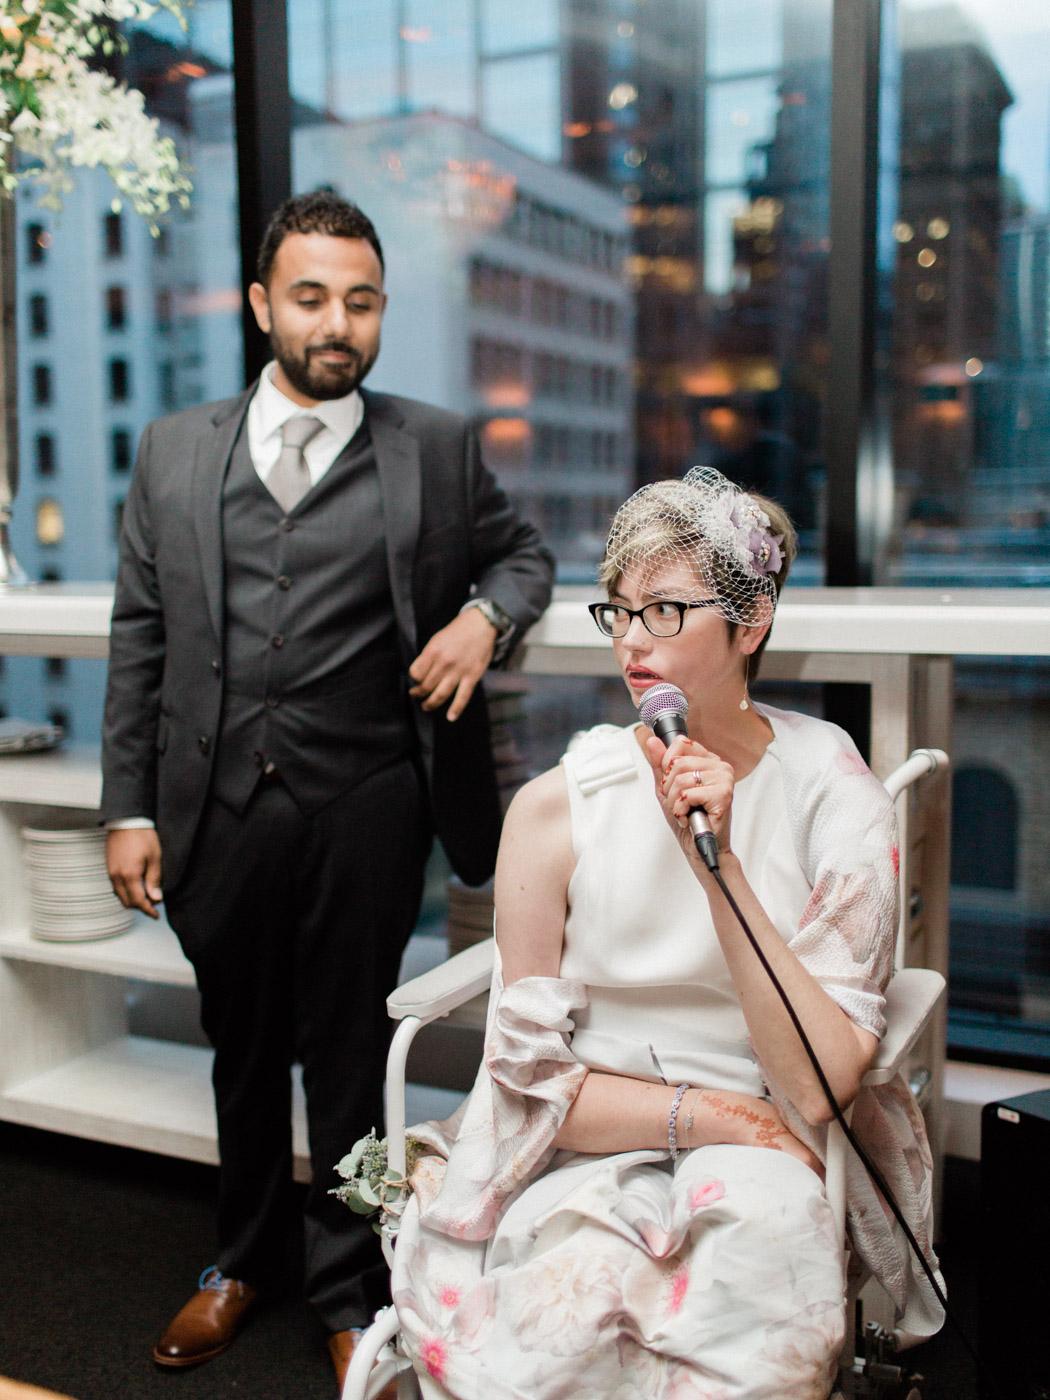 Toronto-wedding-photographer-intimate-restaurant-elopement-chase-oyster-downtown56.jpg